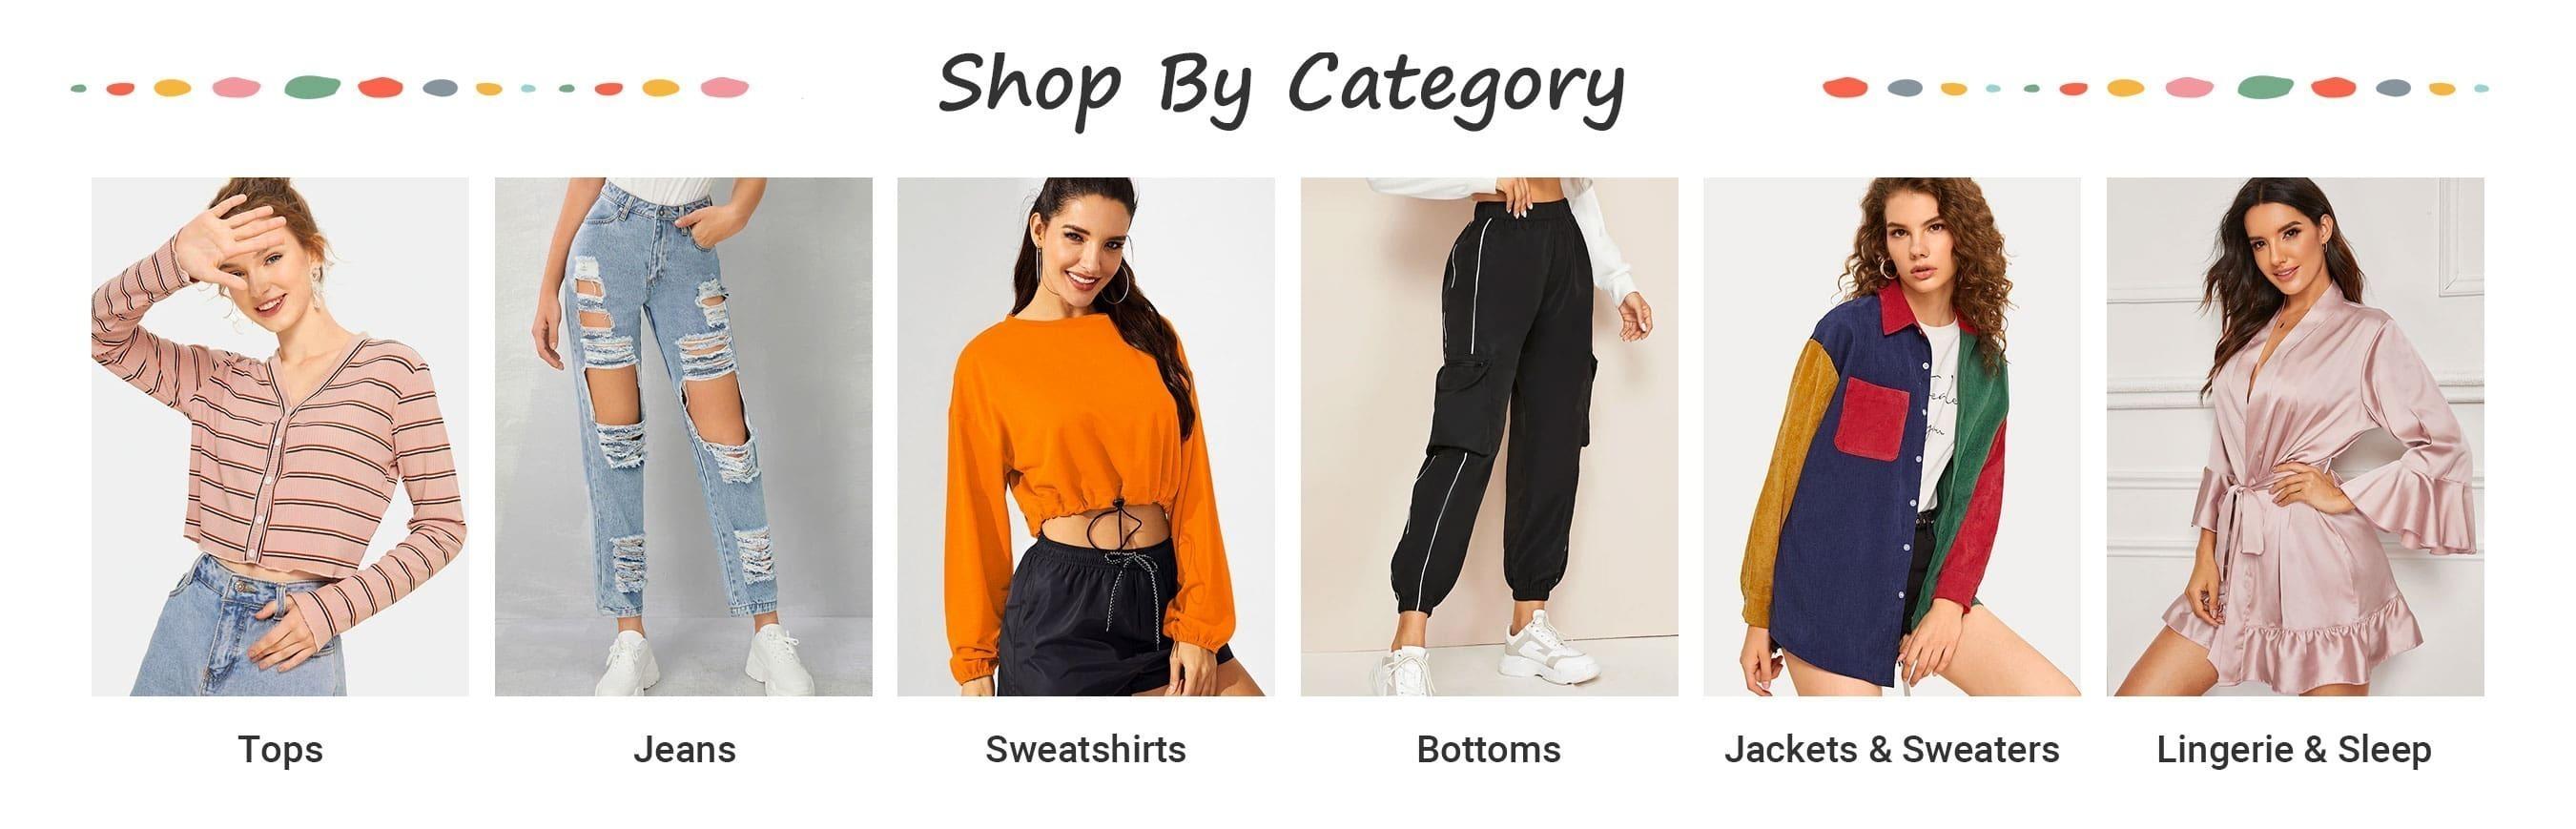 Shop The Latest Girls \u0026 Guys Fashion \u0026 Fun Trends at ROMWE